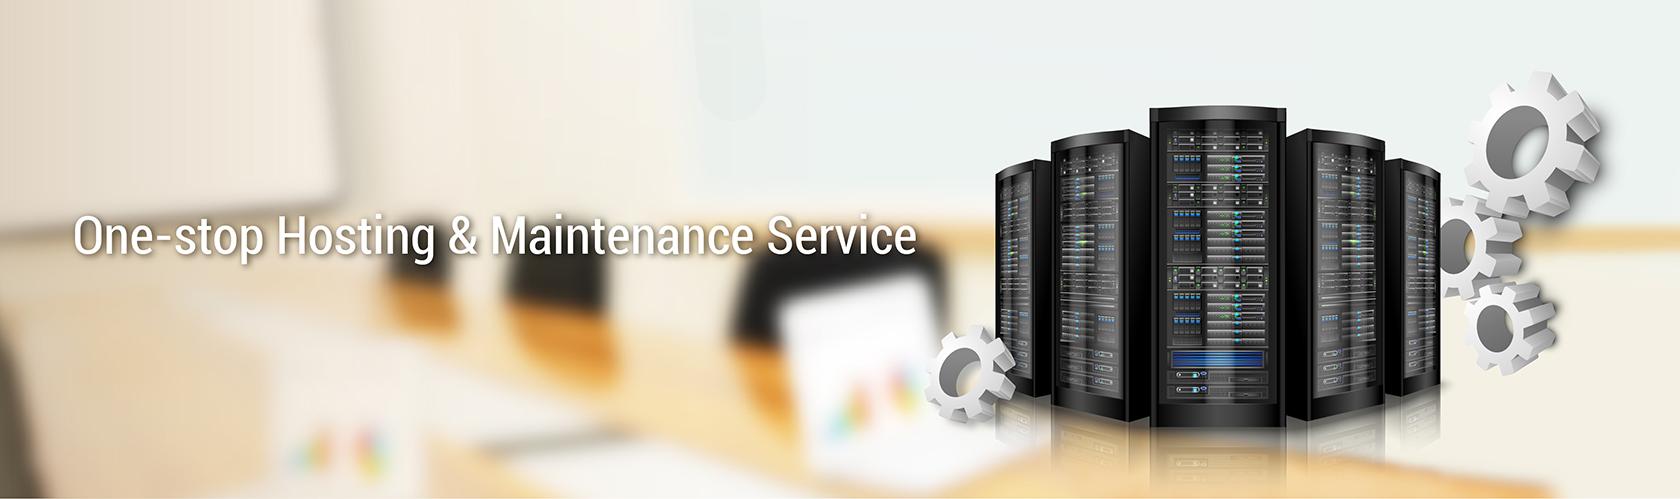 Maintenance-Service_banner-ok_1680